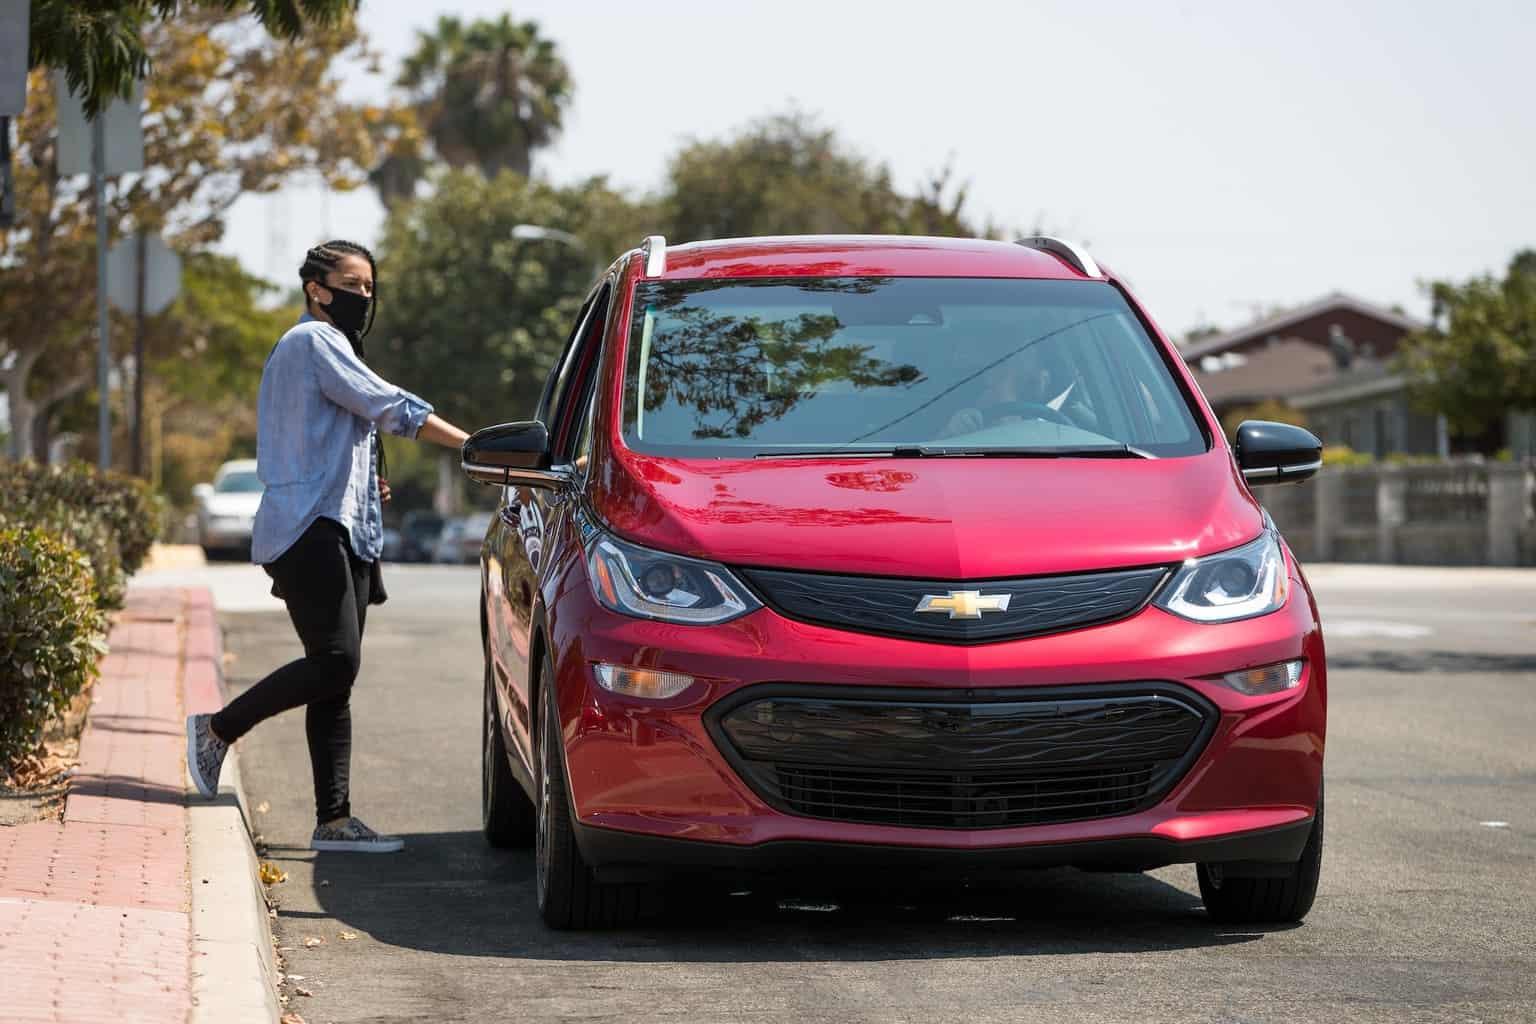 Uber GM Elektroauto Rabatt